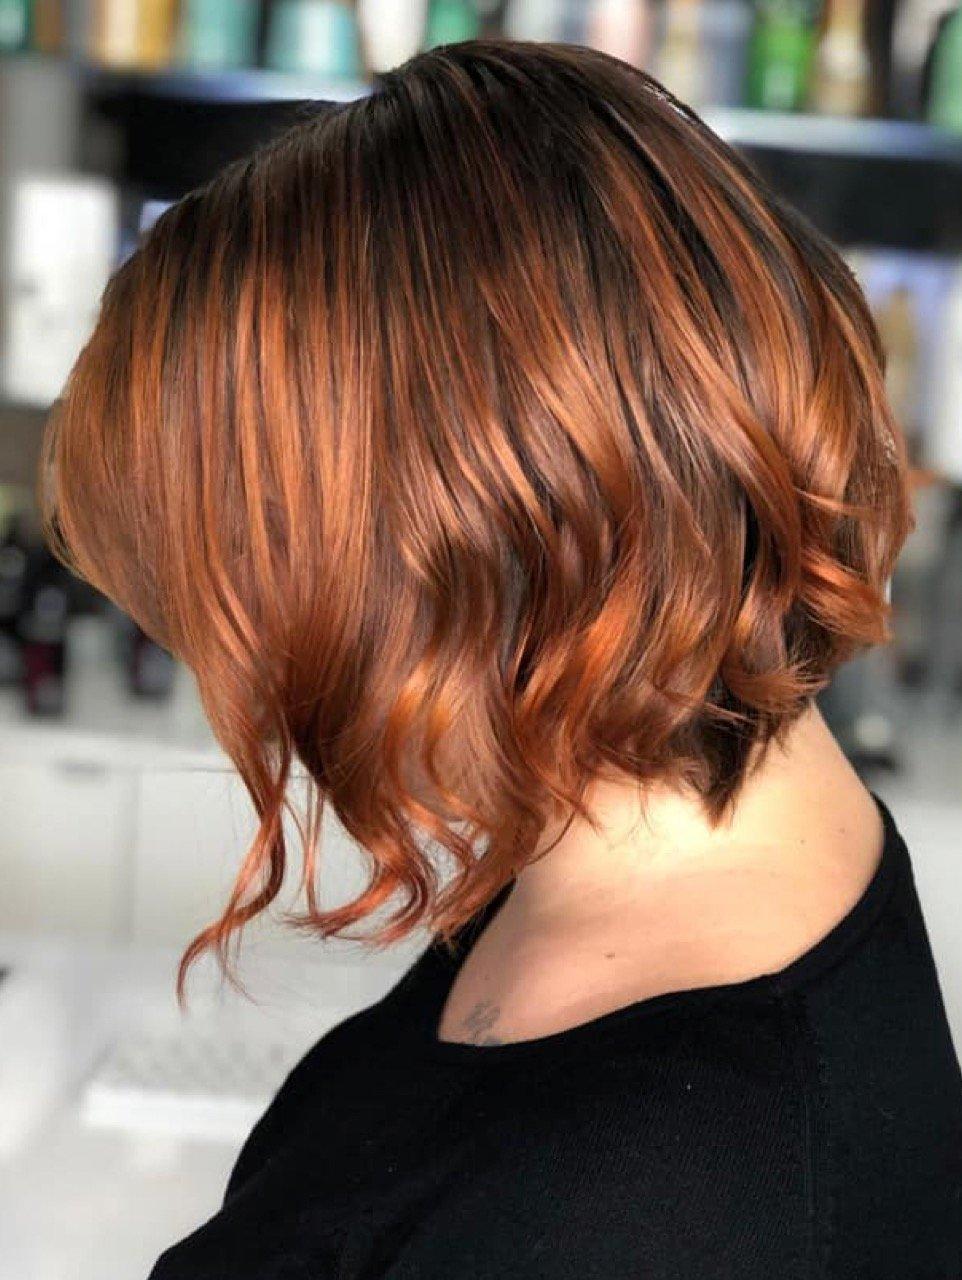 kurze Frisur romantische Wellen